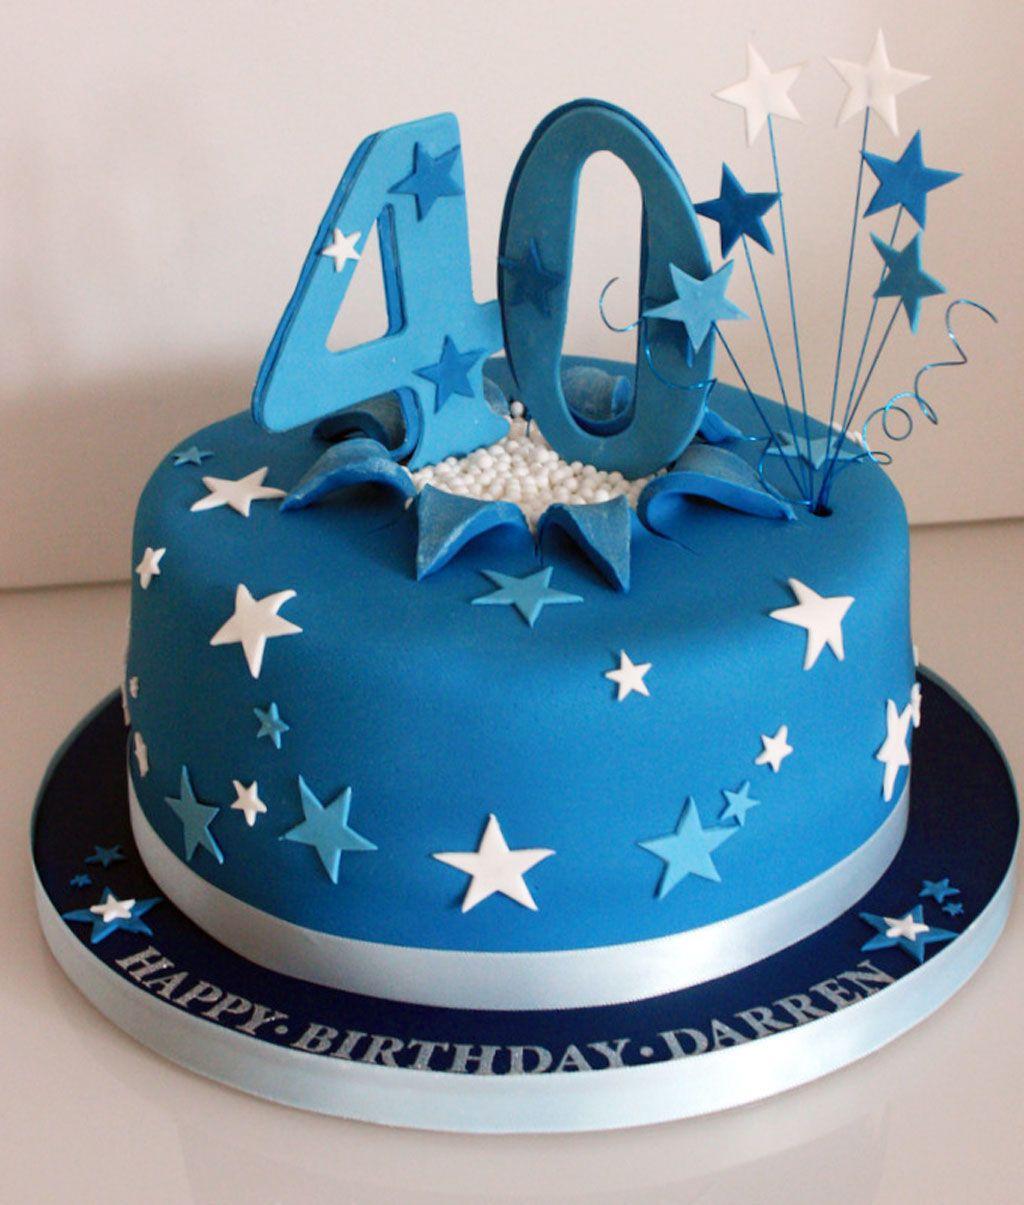 40th Birthday Cake Ideas Funny Sevenzero Parents Pinterest 40